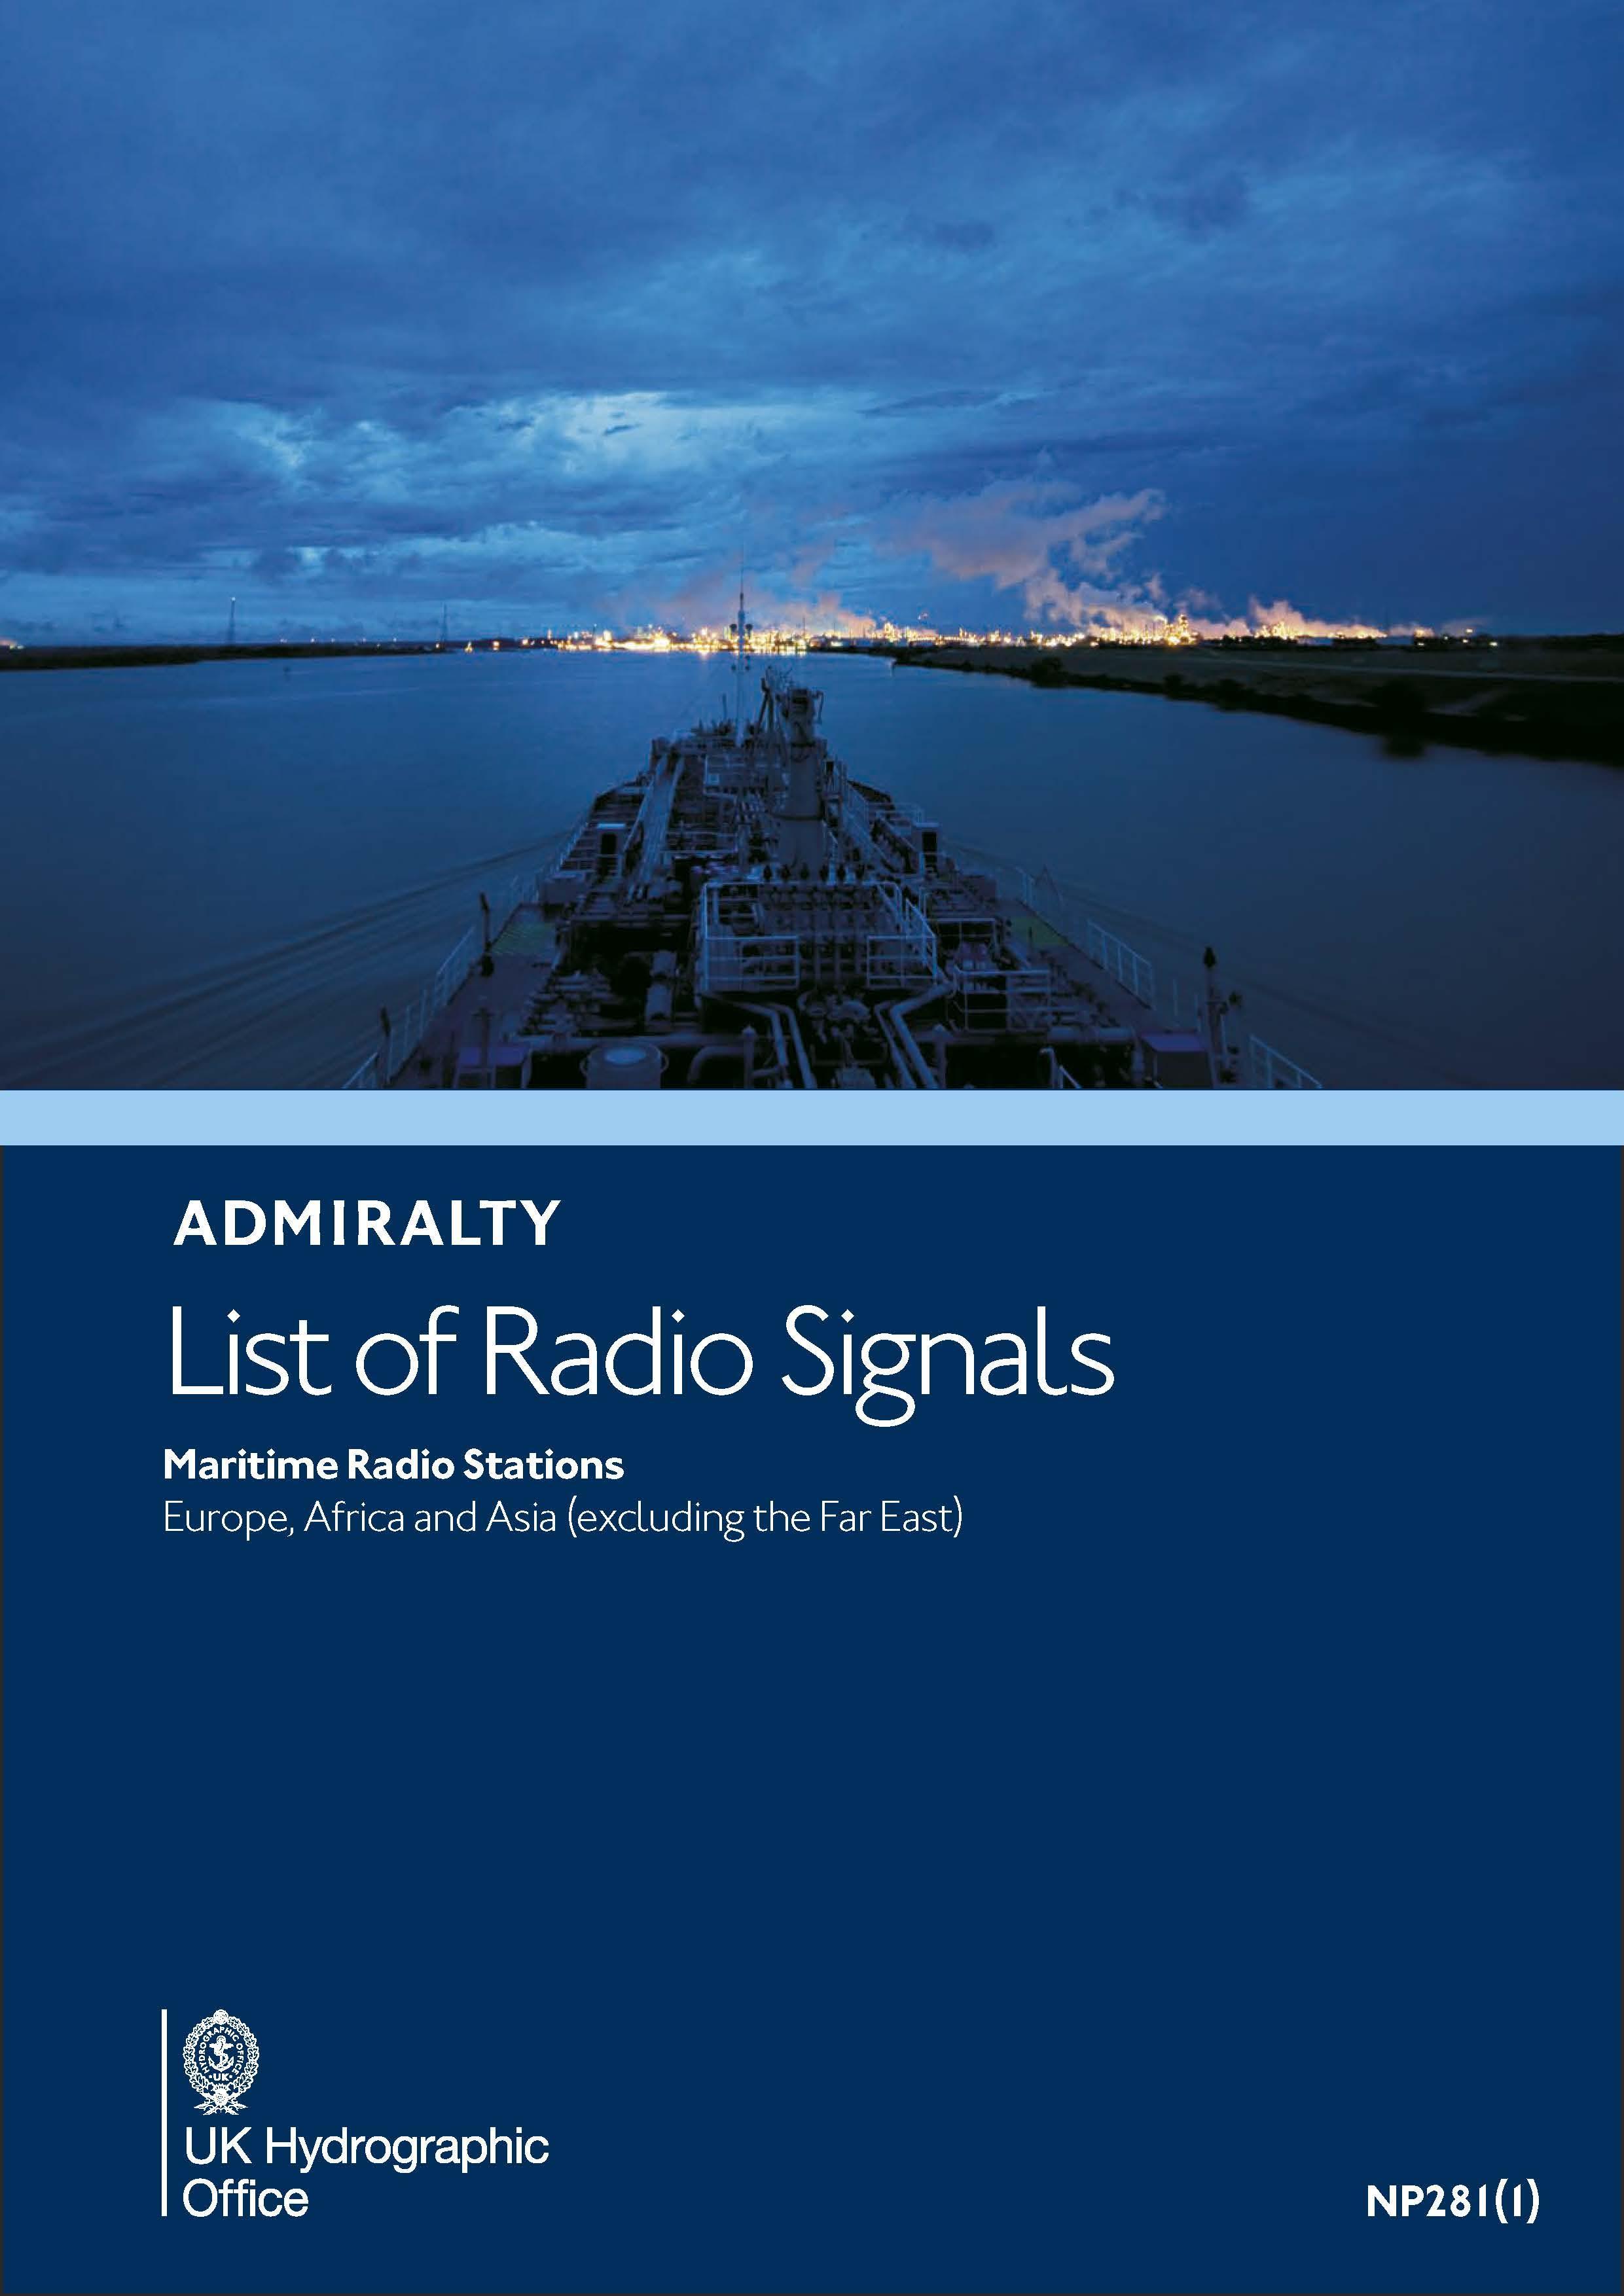 ADMIRALTY NP281(1) RadioSignals - Maritime Radio Stations - EMEA